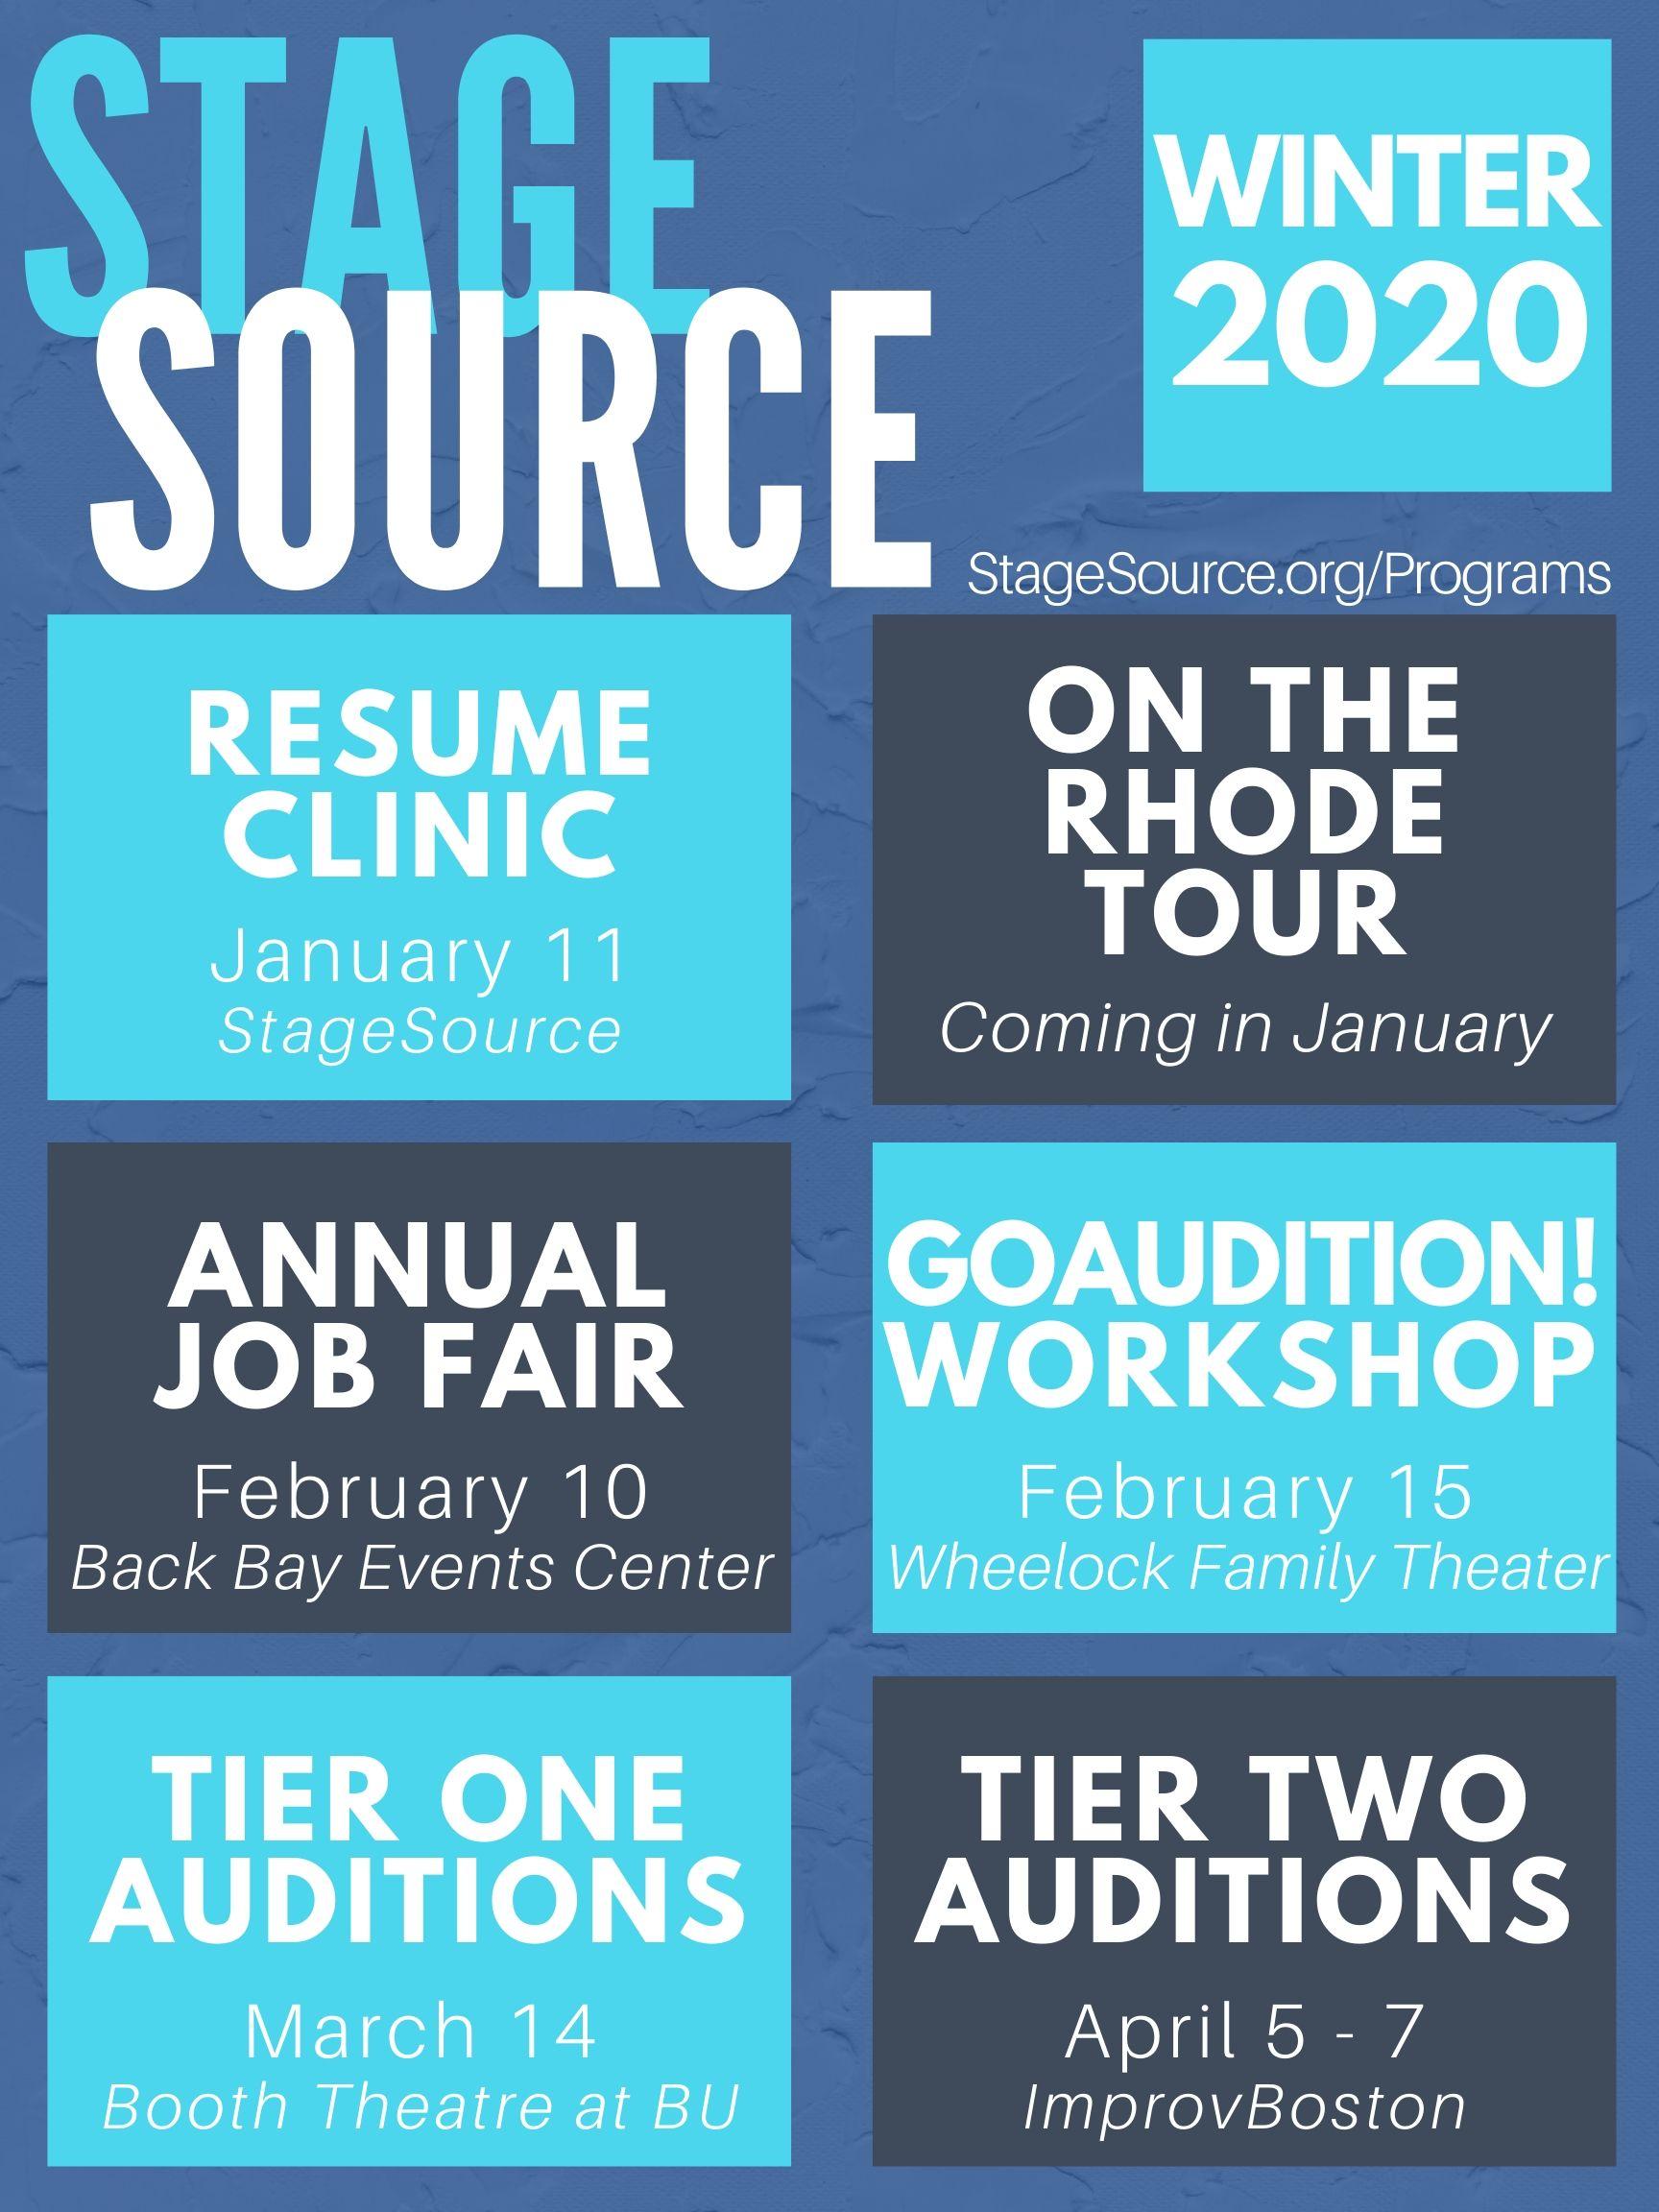 2020 Winter Programs